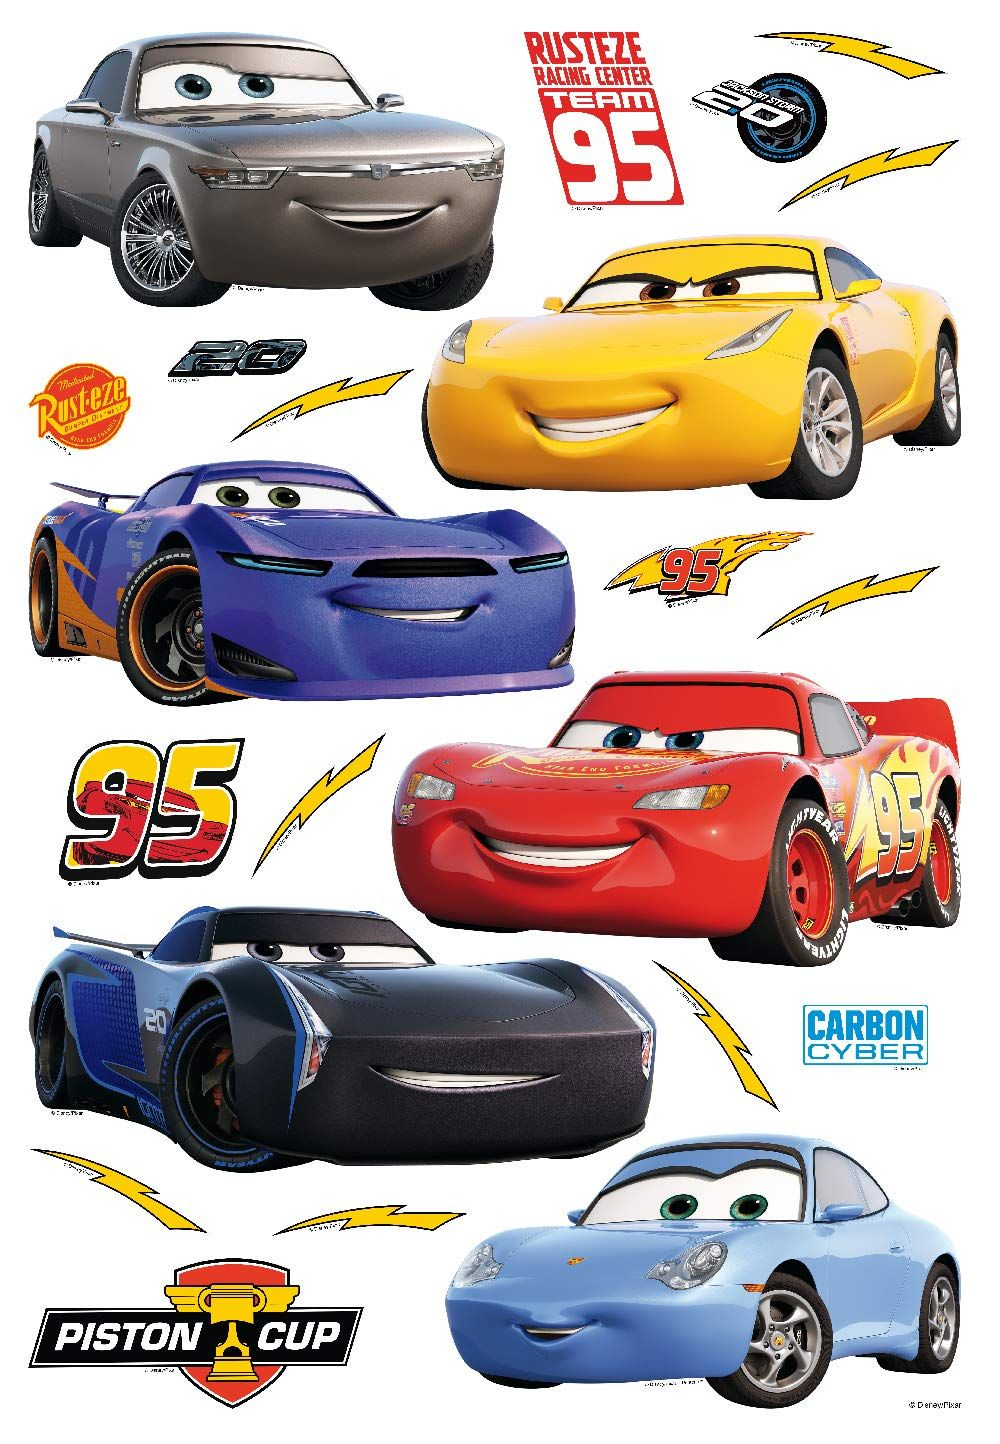 Stickers Geant Cars 3 Flash Mcqueen Sticker Sur Bebegavroche Molniya Makkuin Detskie Postery Multfilmy [ 1444 x 1000 Pixel ]